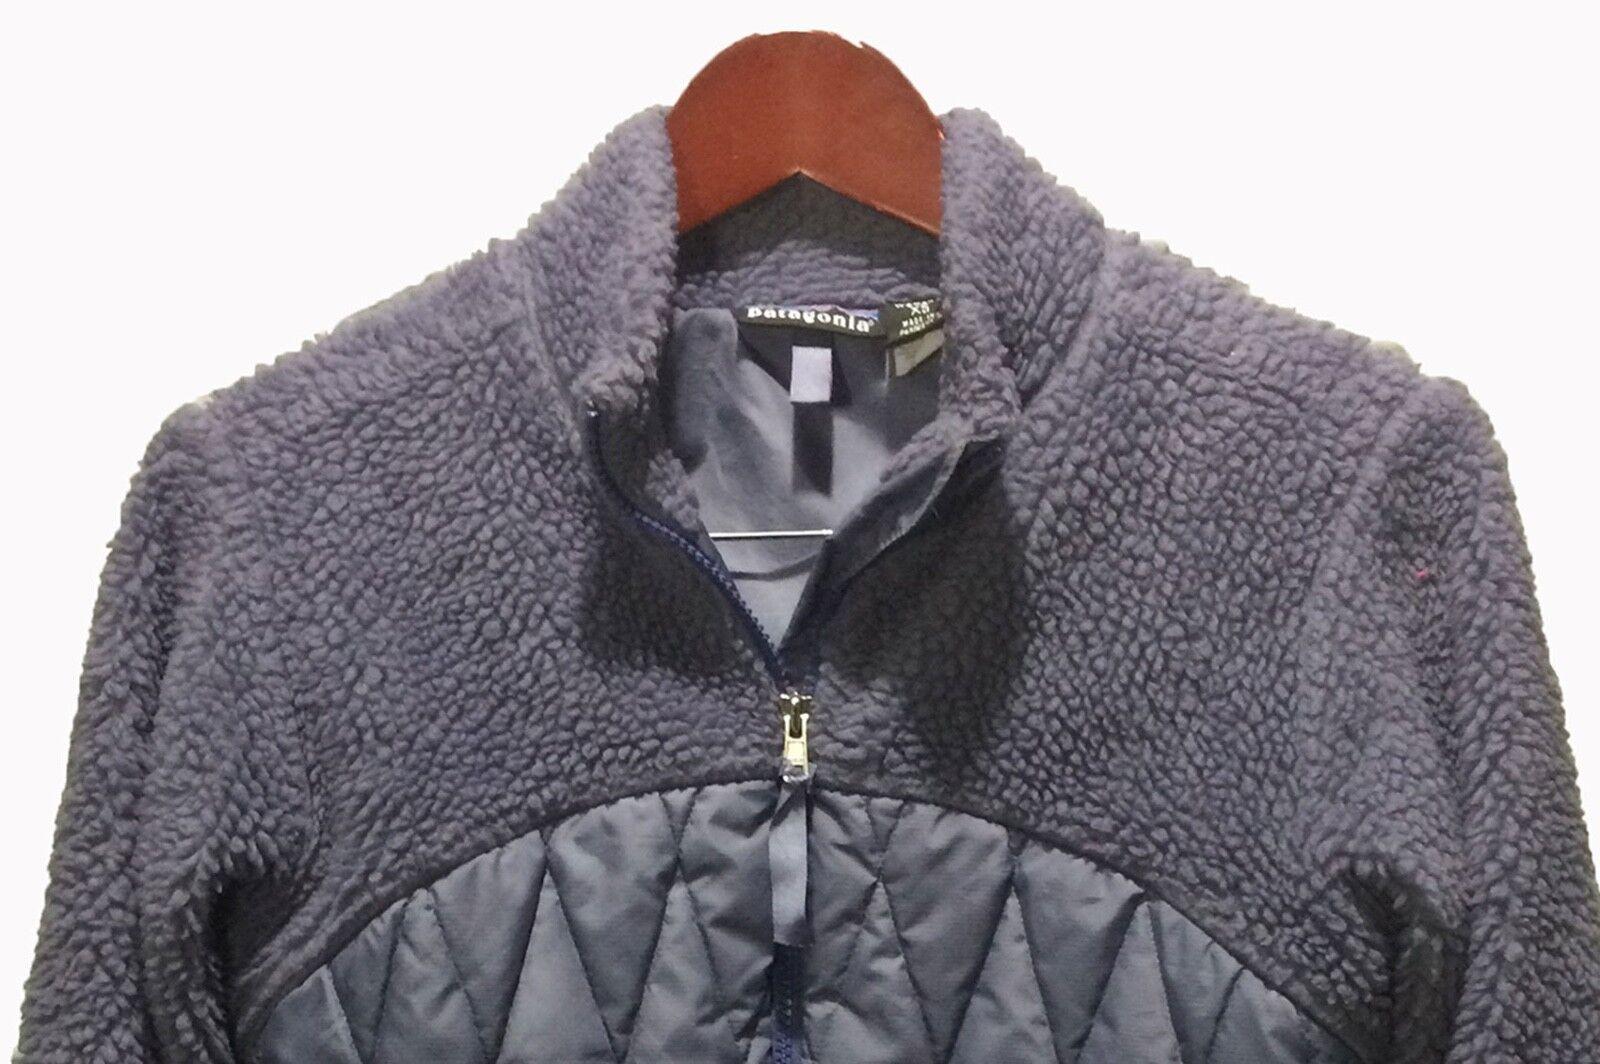 PATAGONIA Cardigan Full Zip Fleece Sweater Purple Women's Size XS